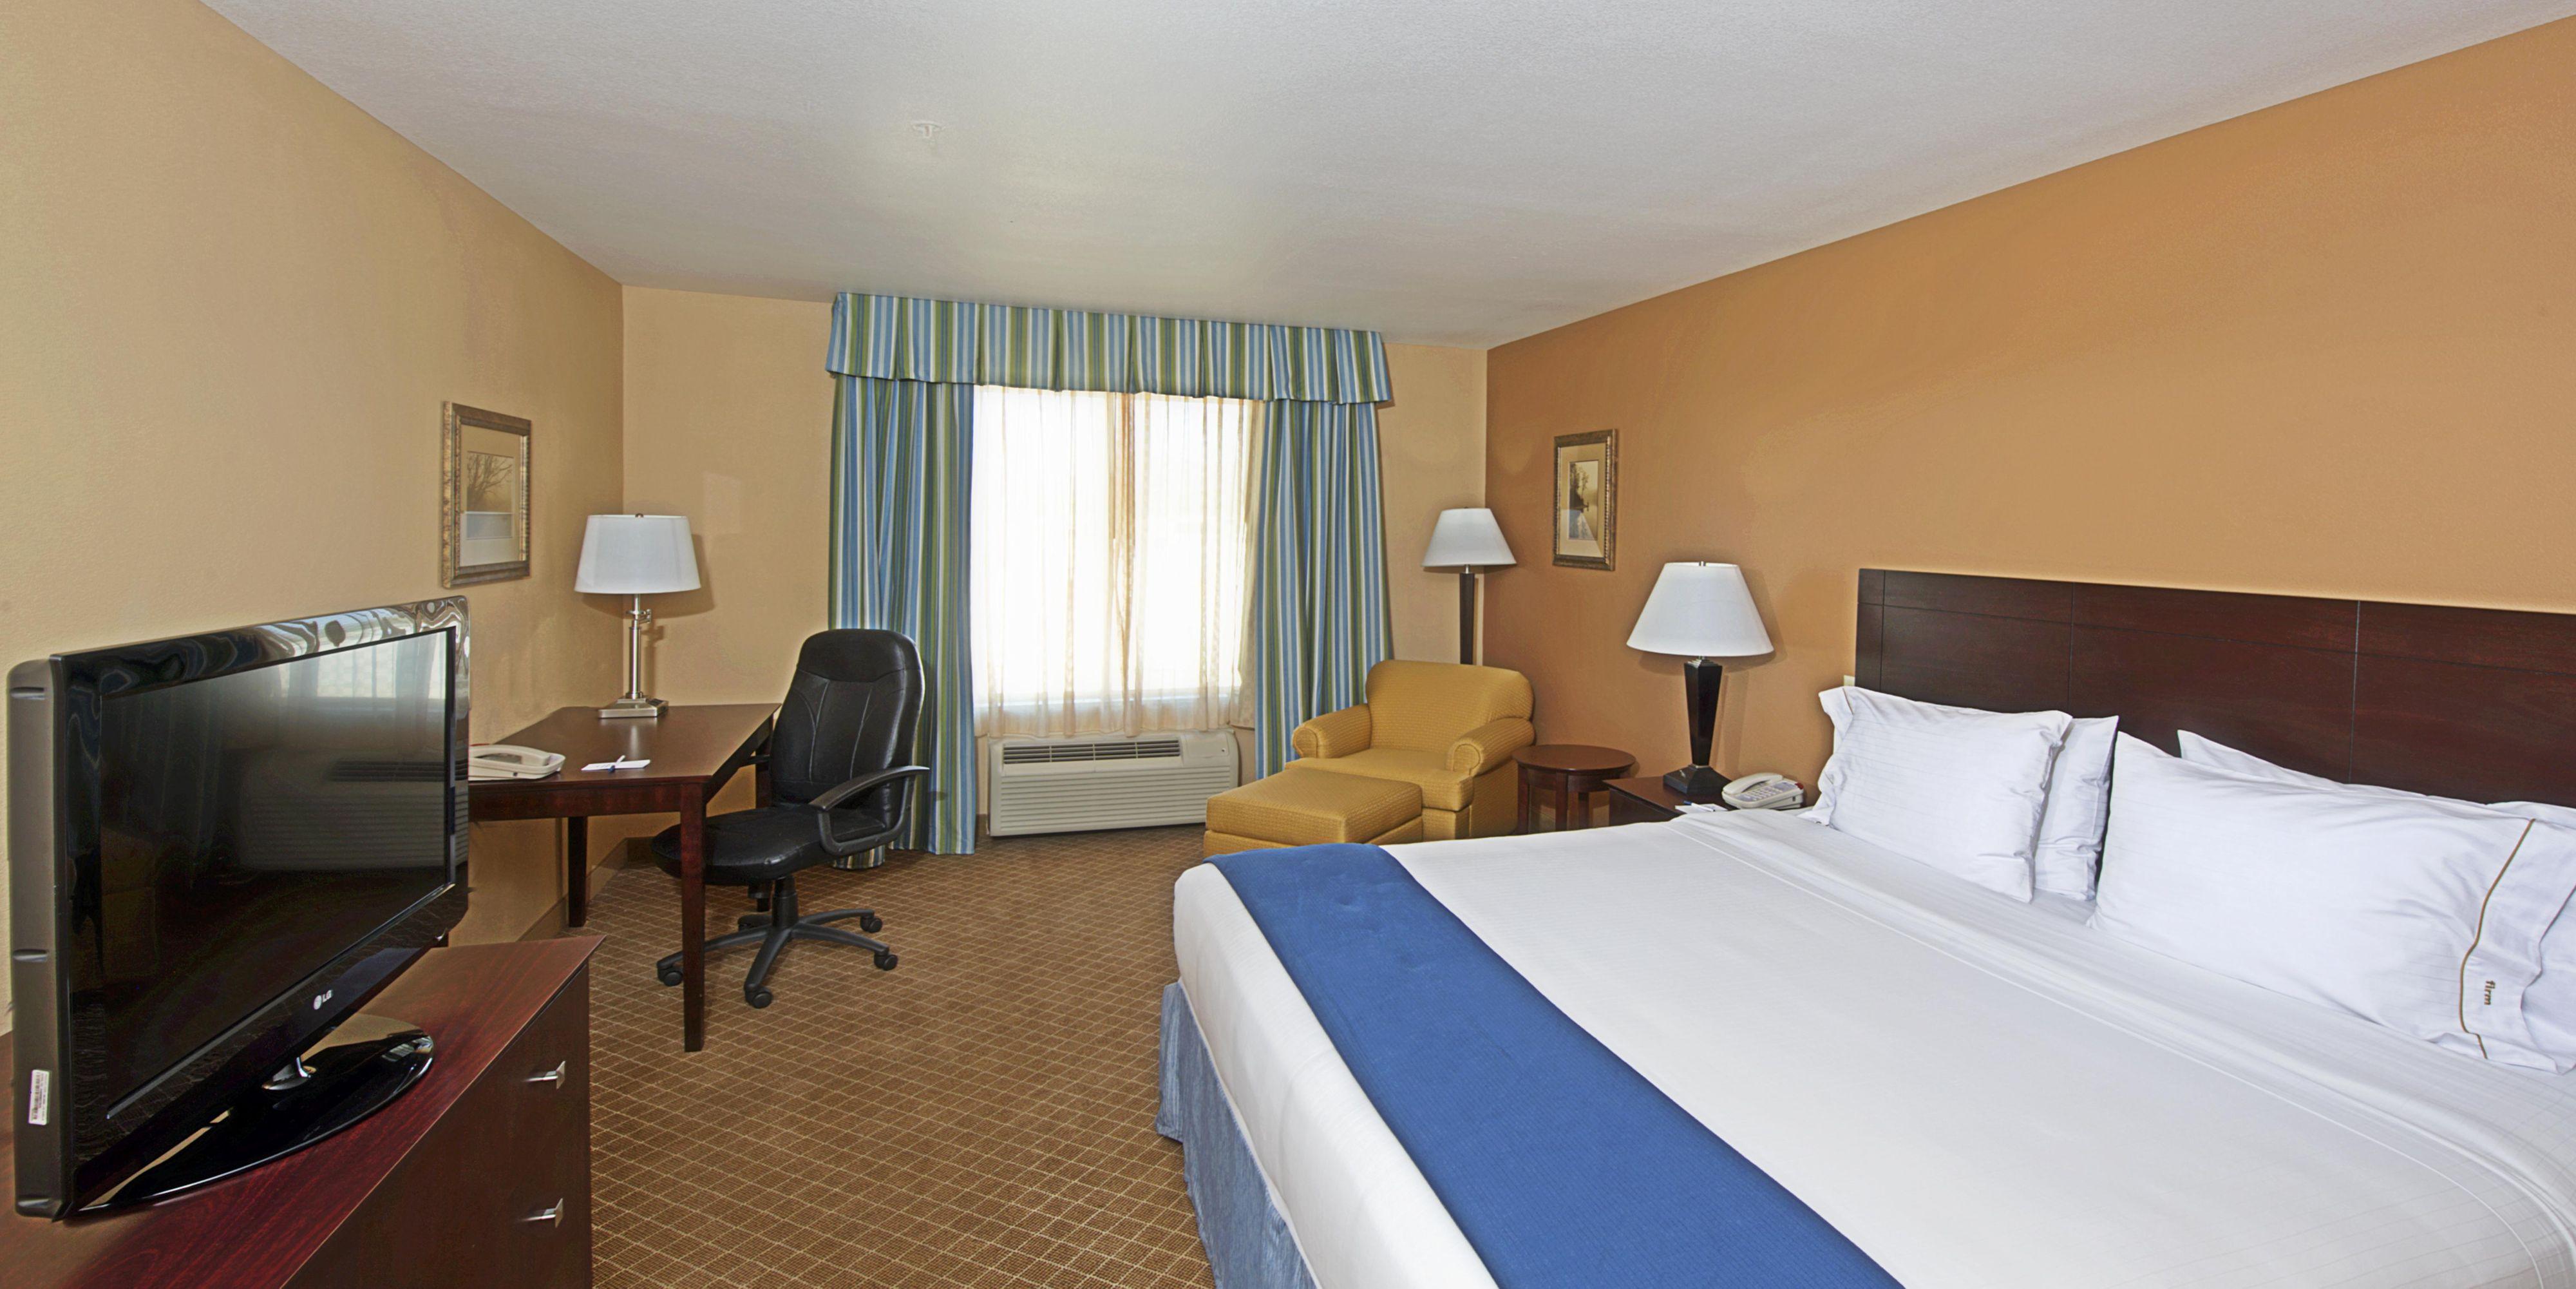 Tucson hotel suite 2018 world 39 s best hotels for 2 bedroom suite hotels in tucson az